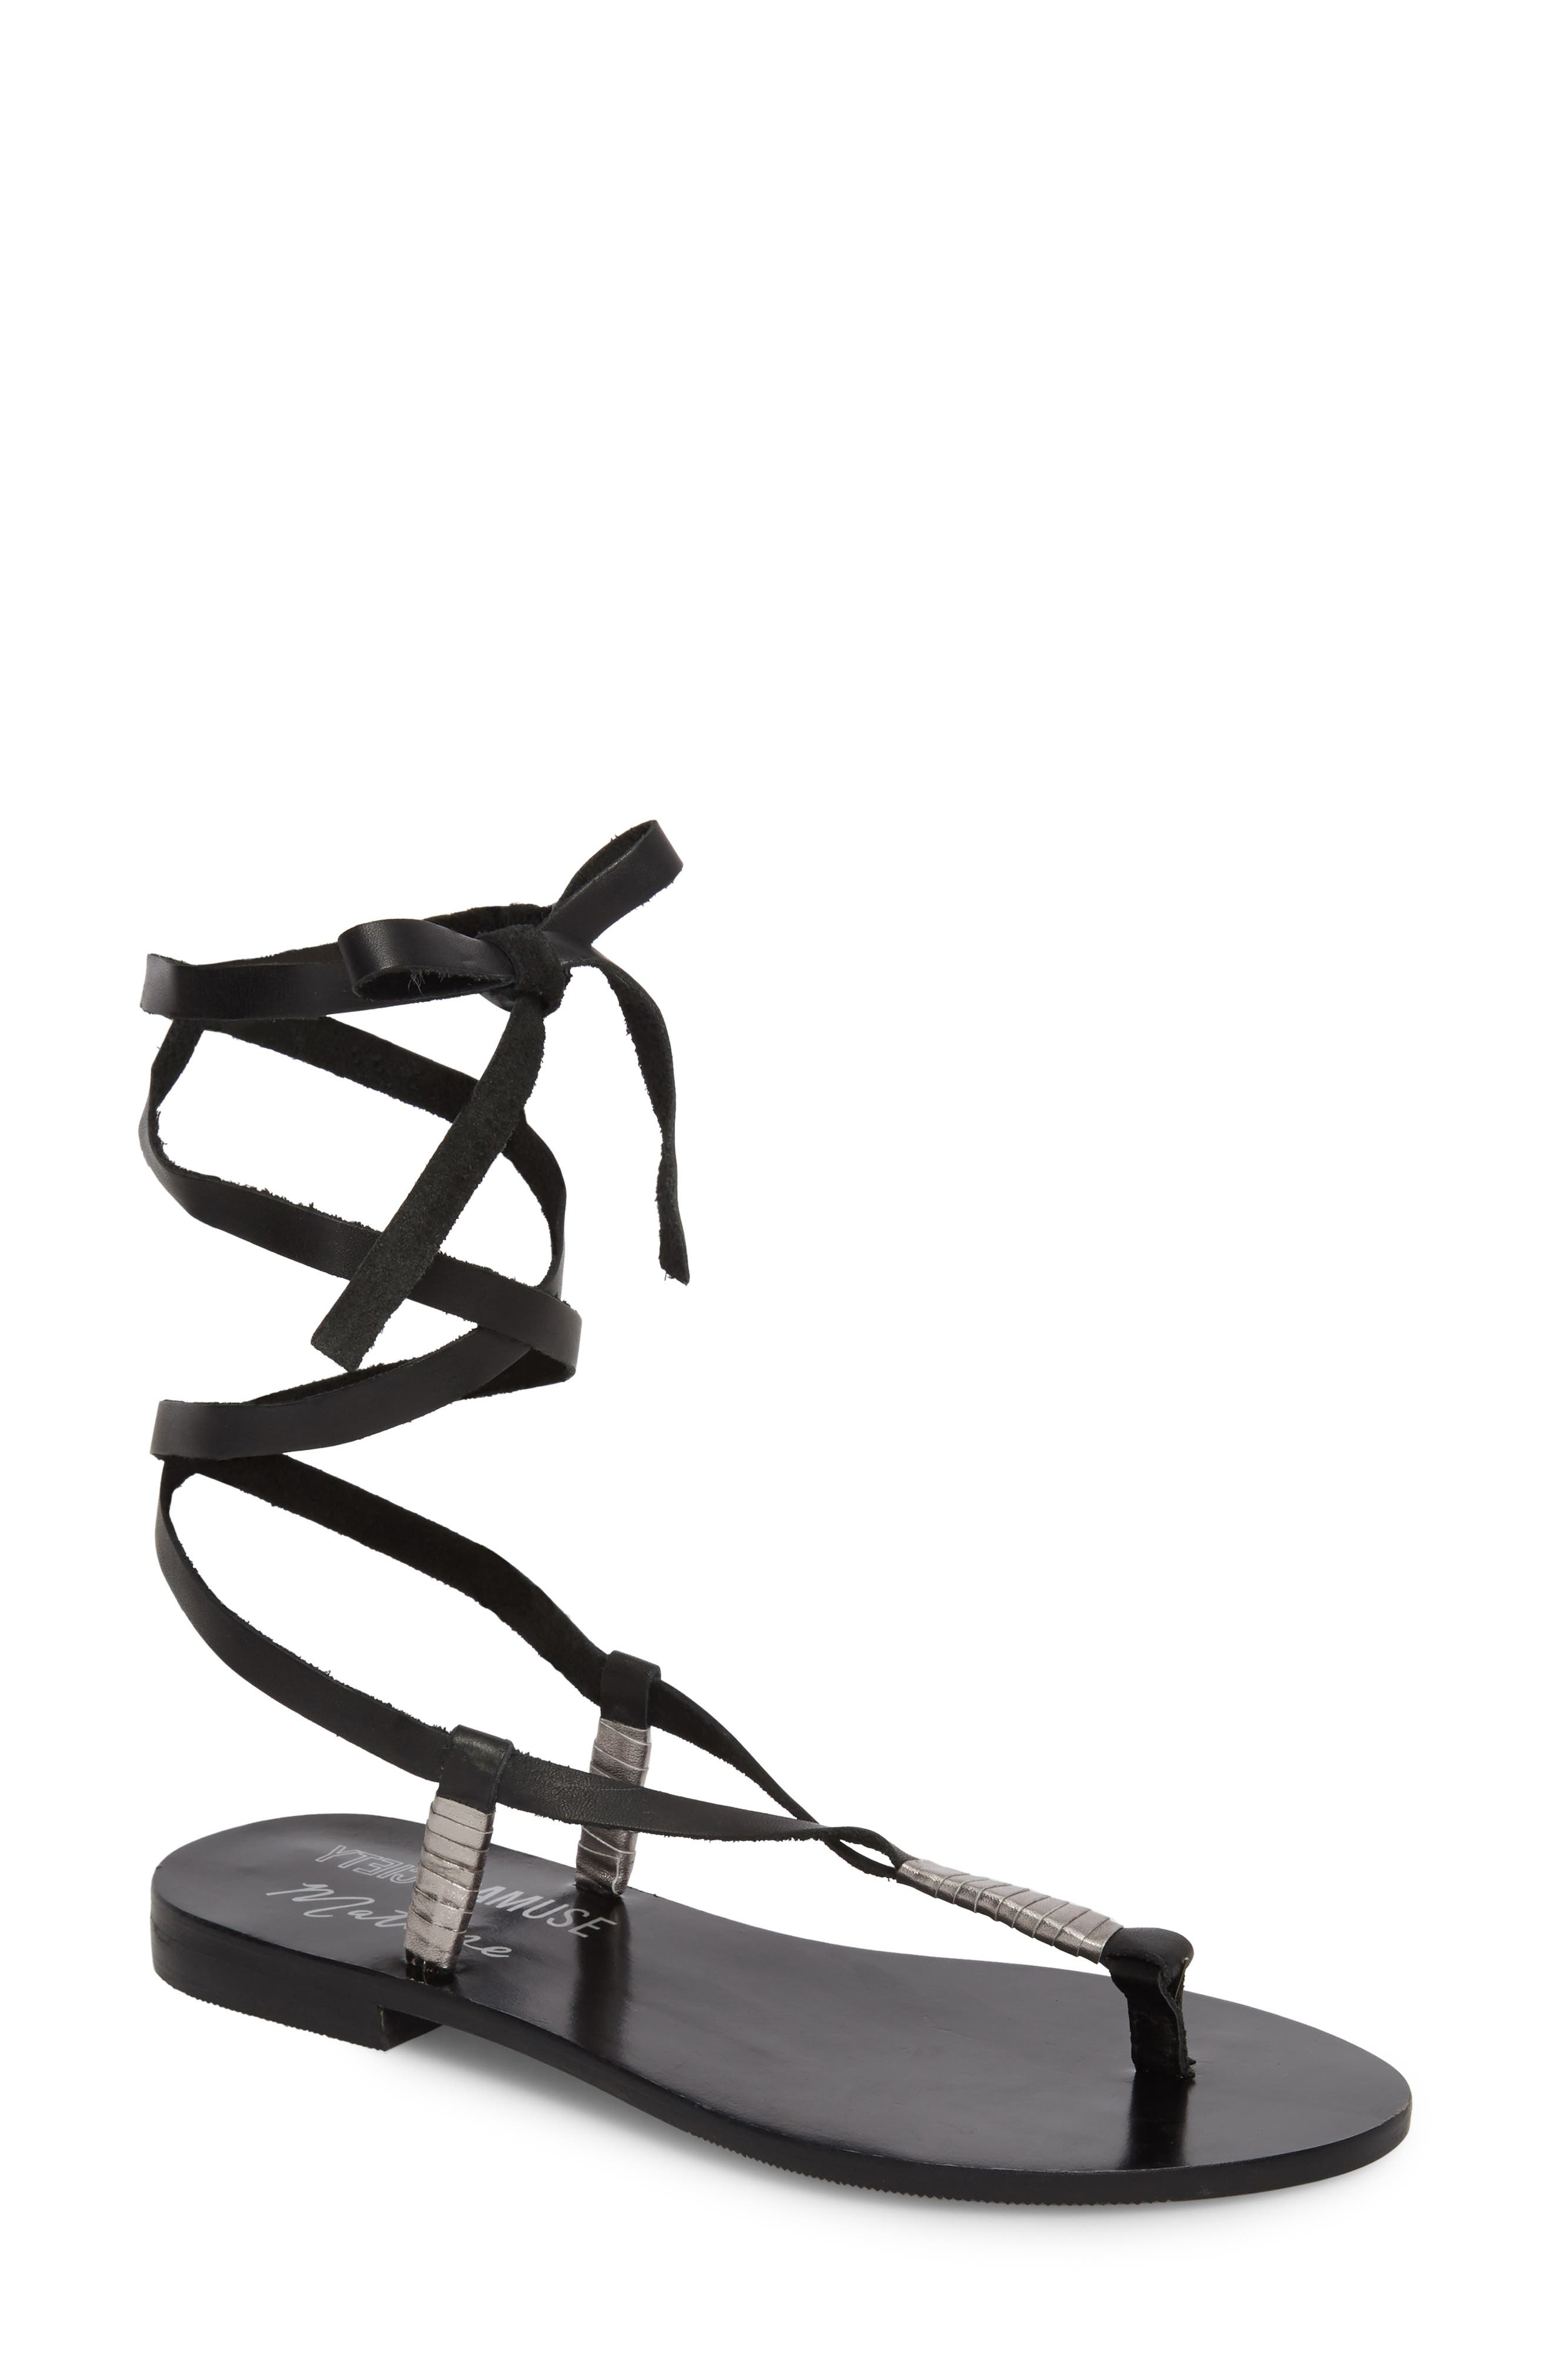 Amuse Society X Matisse Positano Sandal